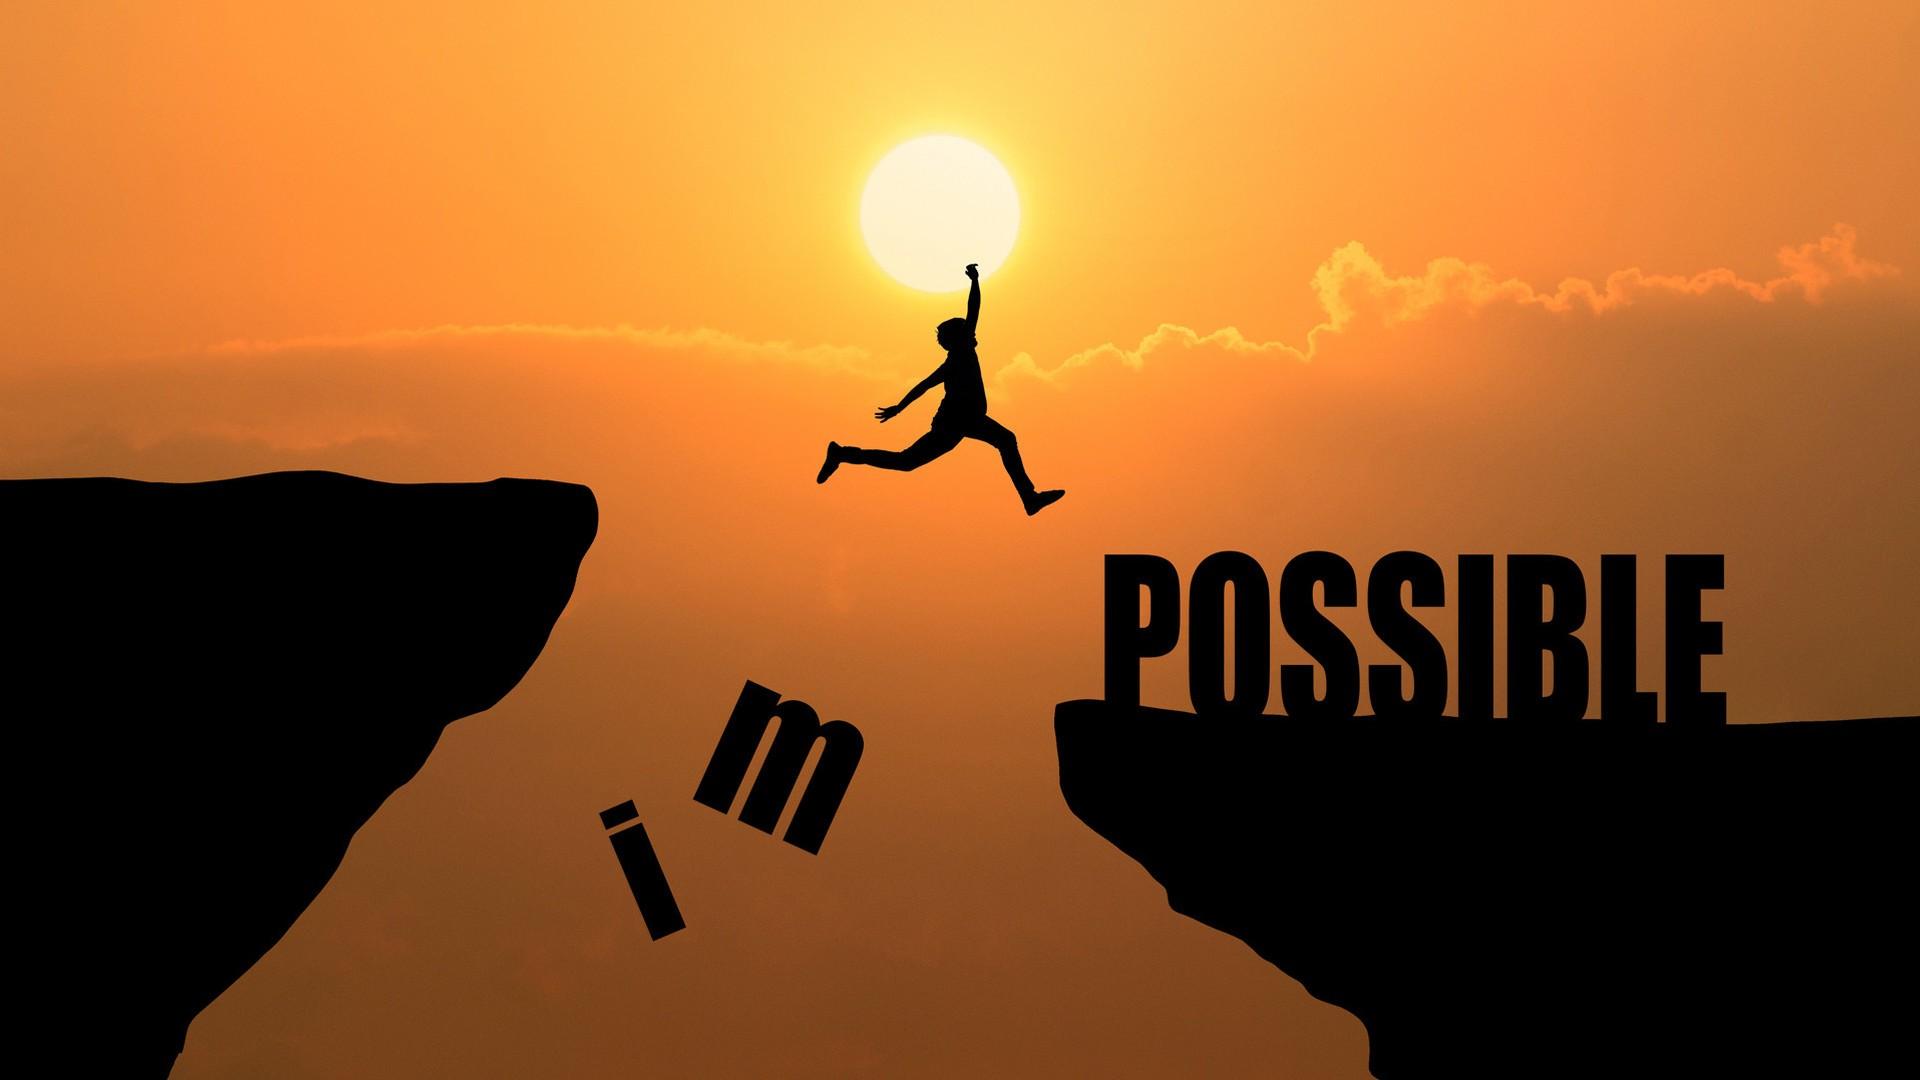 Motivational wallpaper download